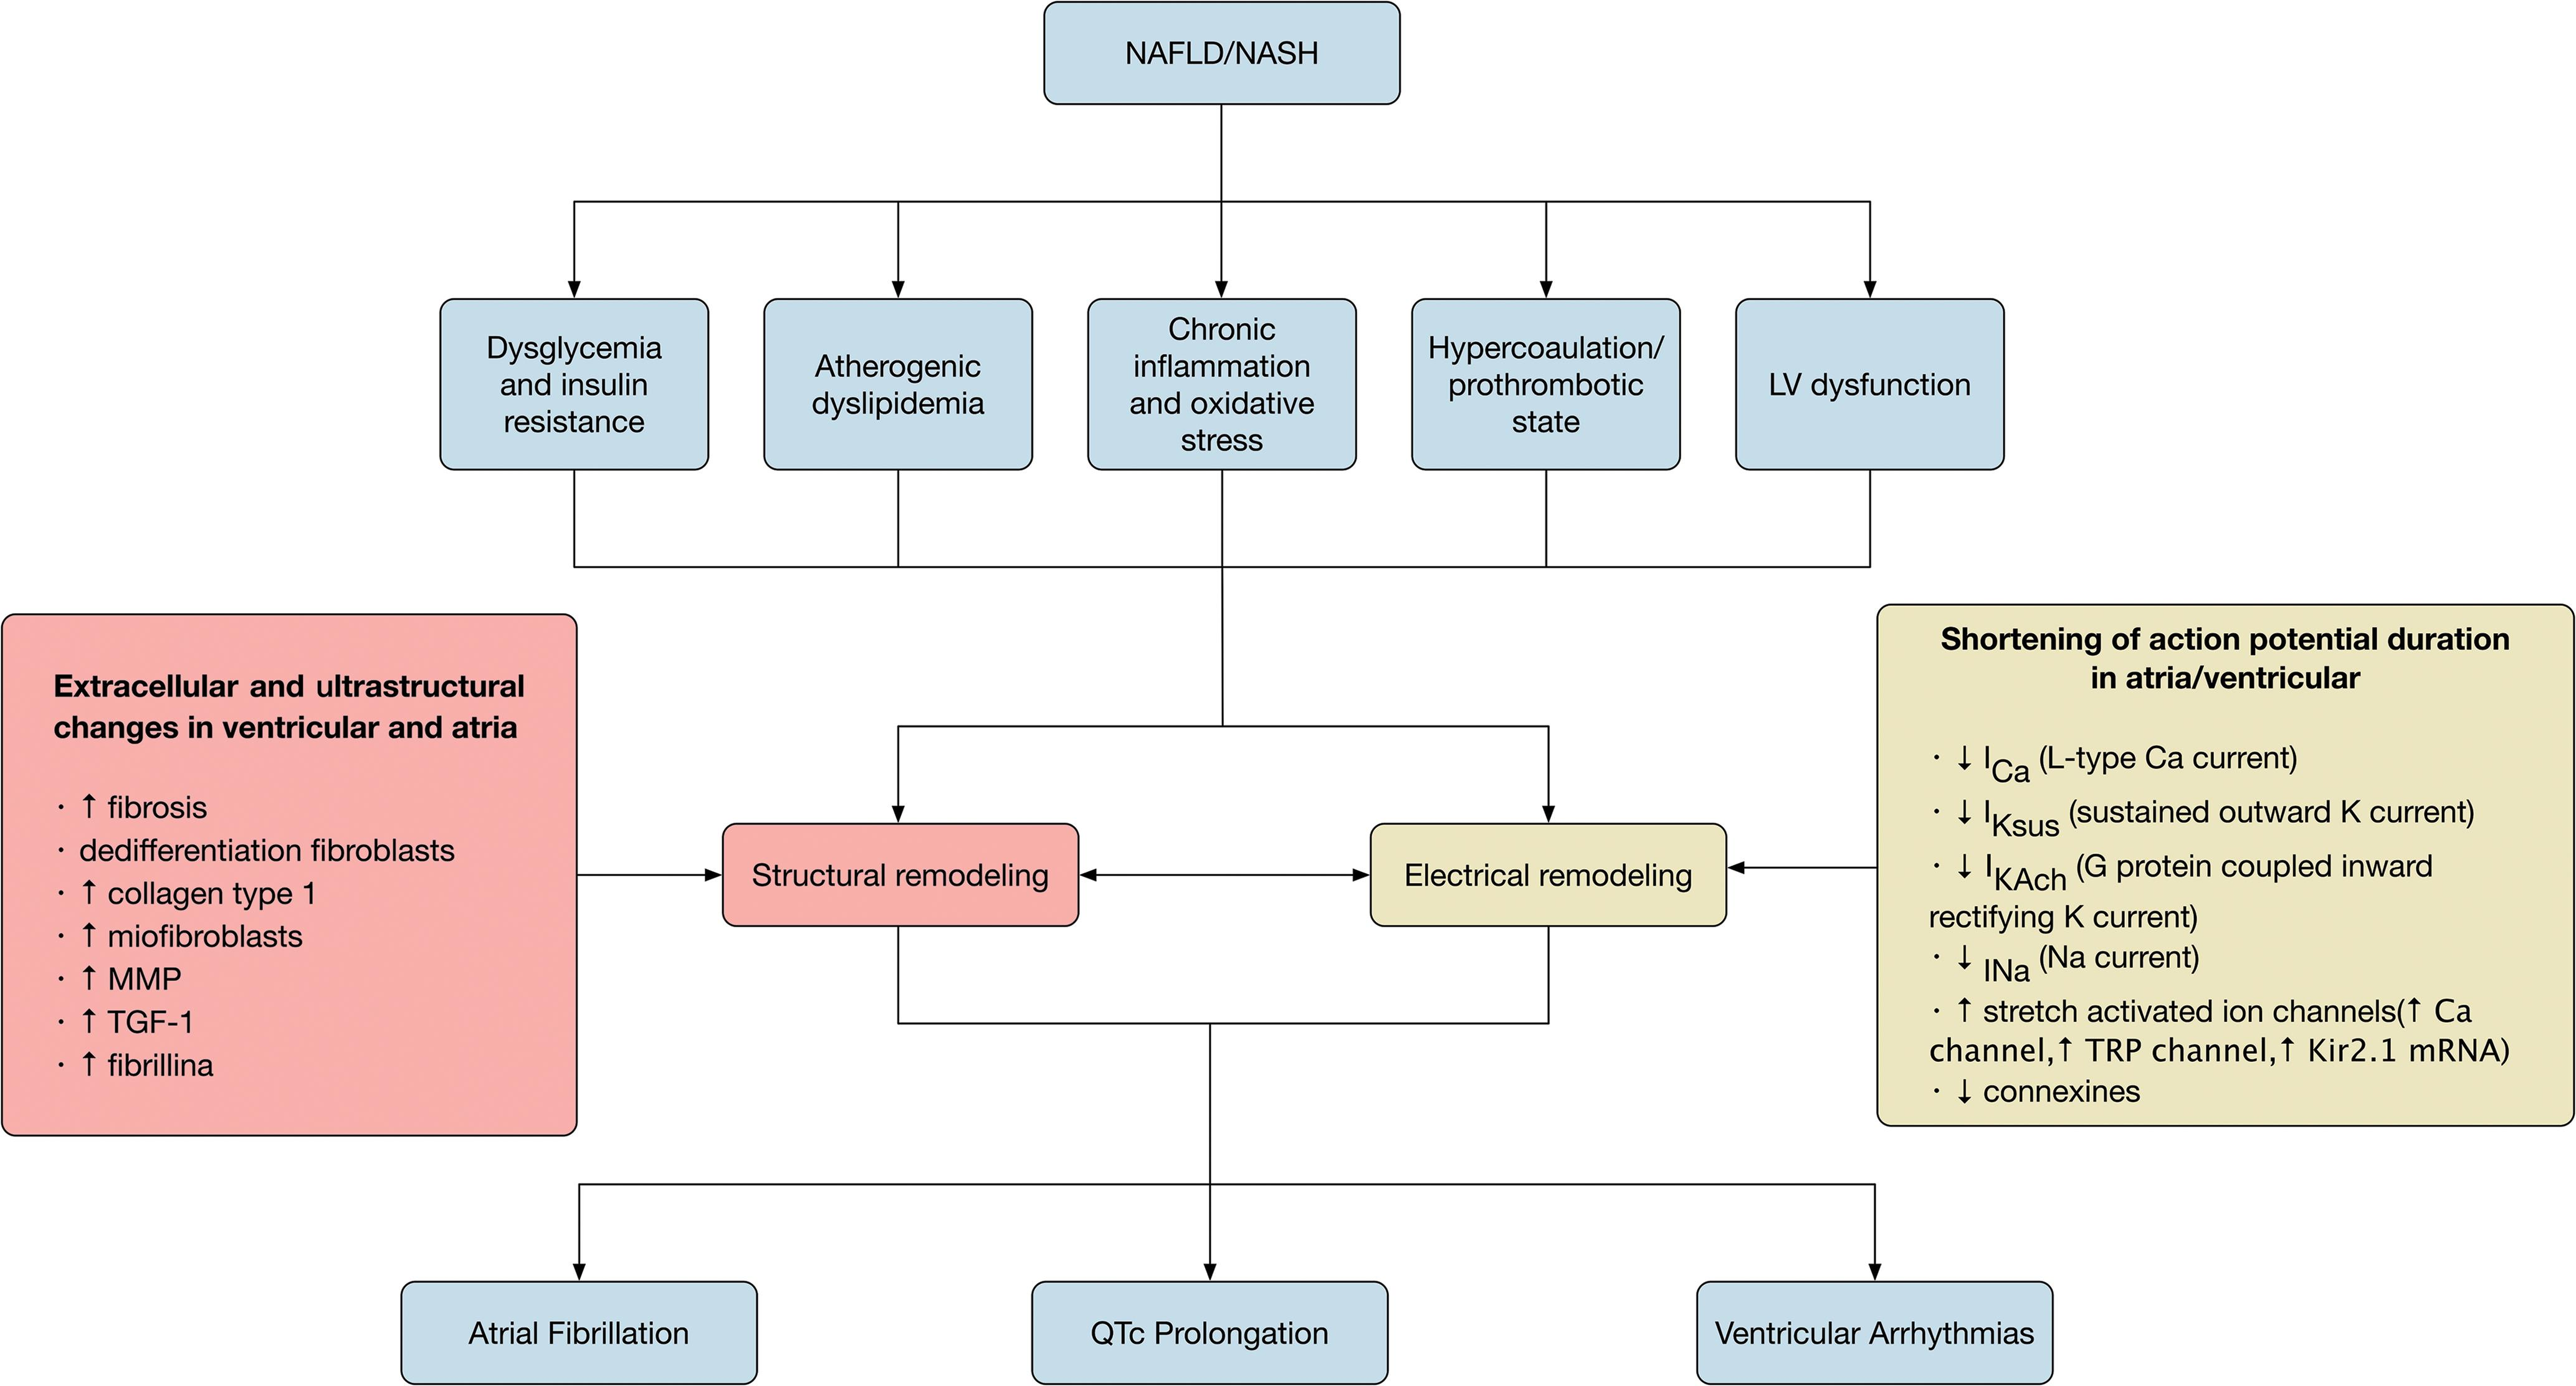 Putative biological mechanisms linking NAFLD and risk of cardiac arrhythmias (<italic>i.e.</italic> atrial fibrillation, QTc interval prolongation and ventricular arrhythmias).